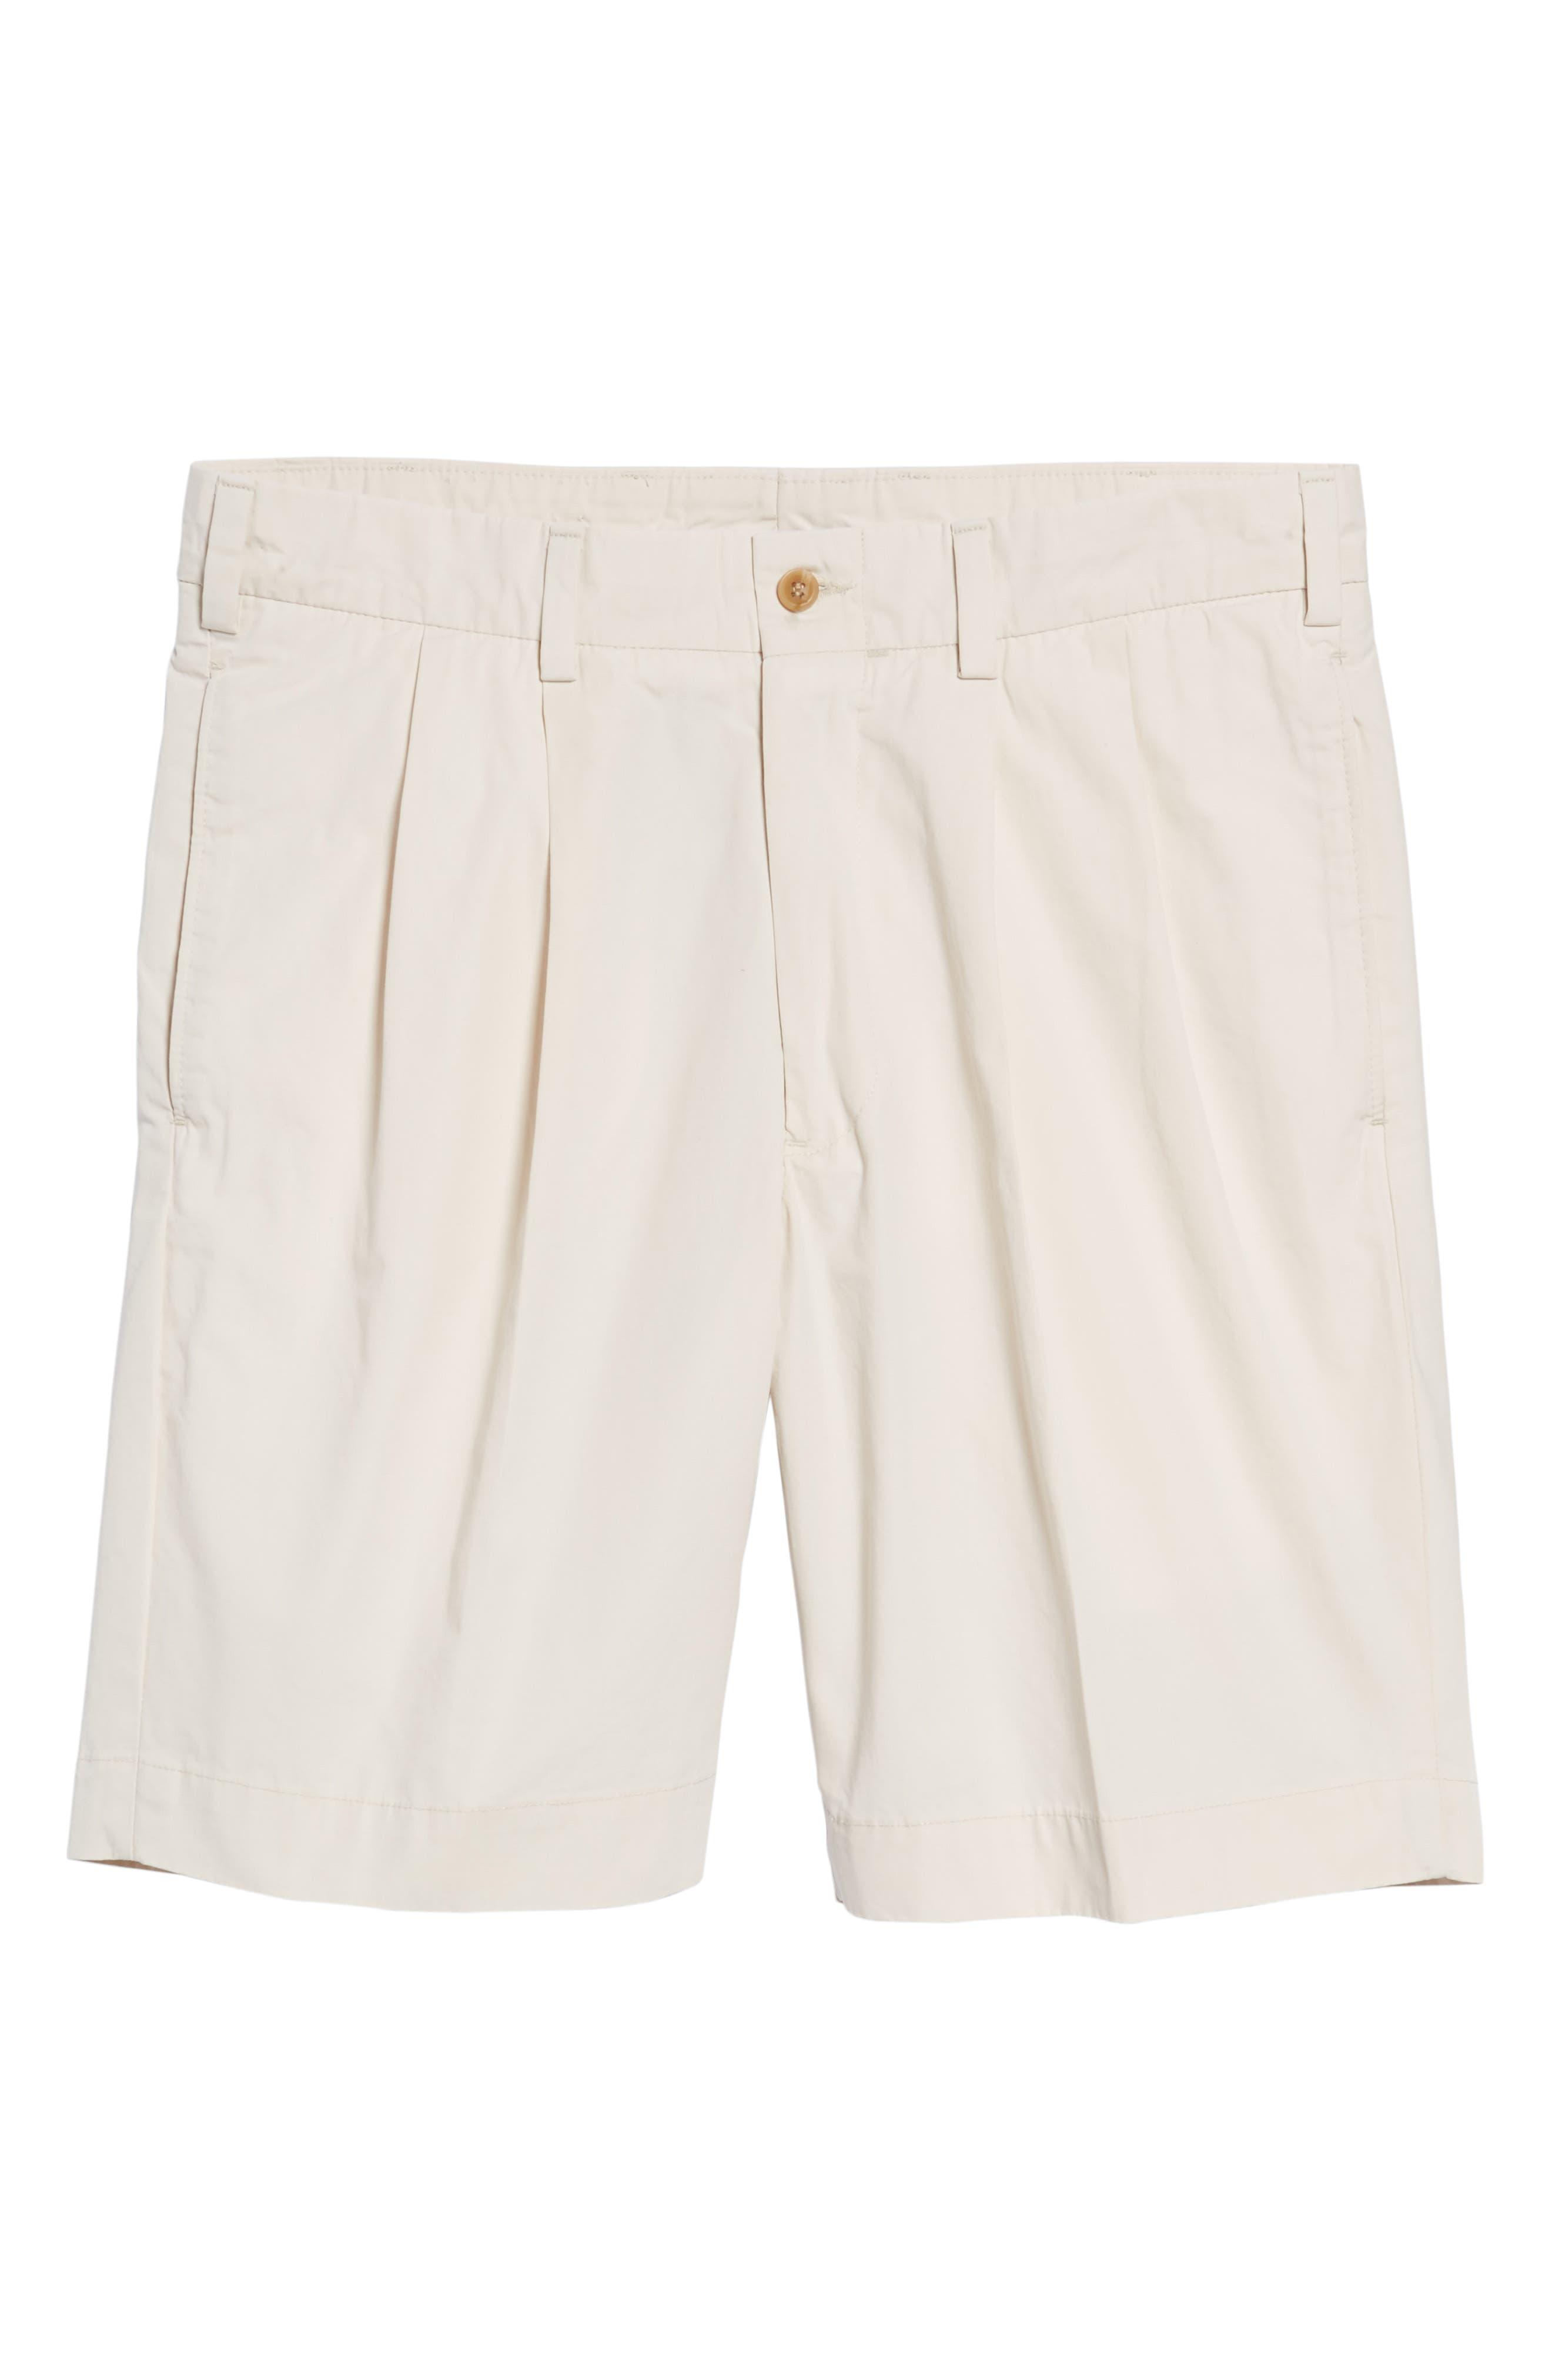 M2 Classic Fit Pleated Tropical Cotton Poplin Shorts,                             Alternate thumbnail 6, color,                             280